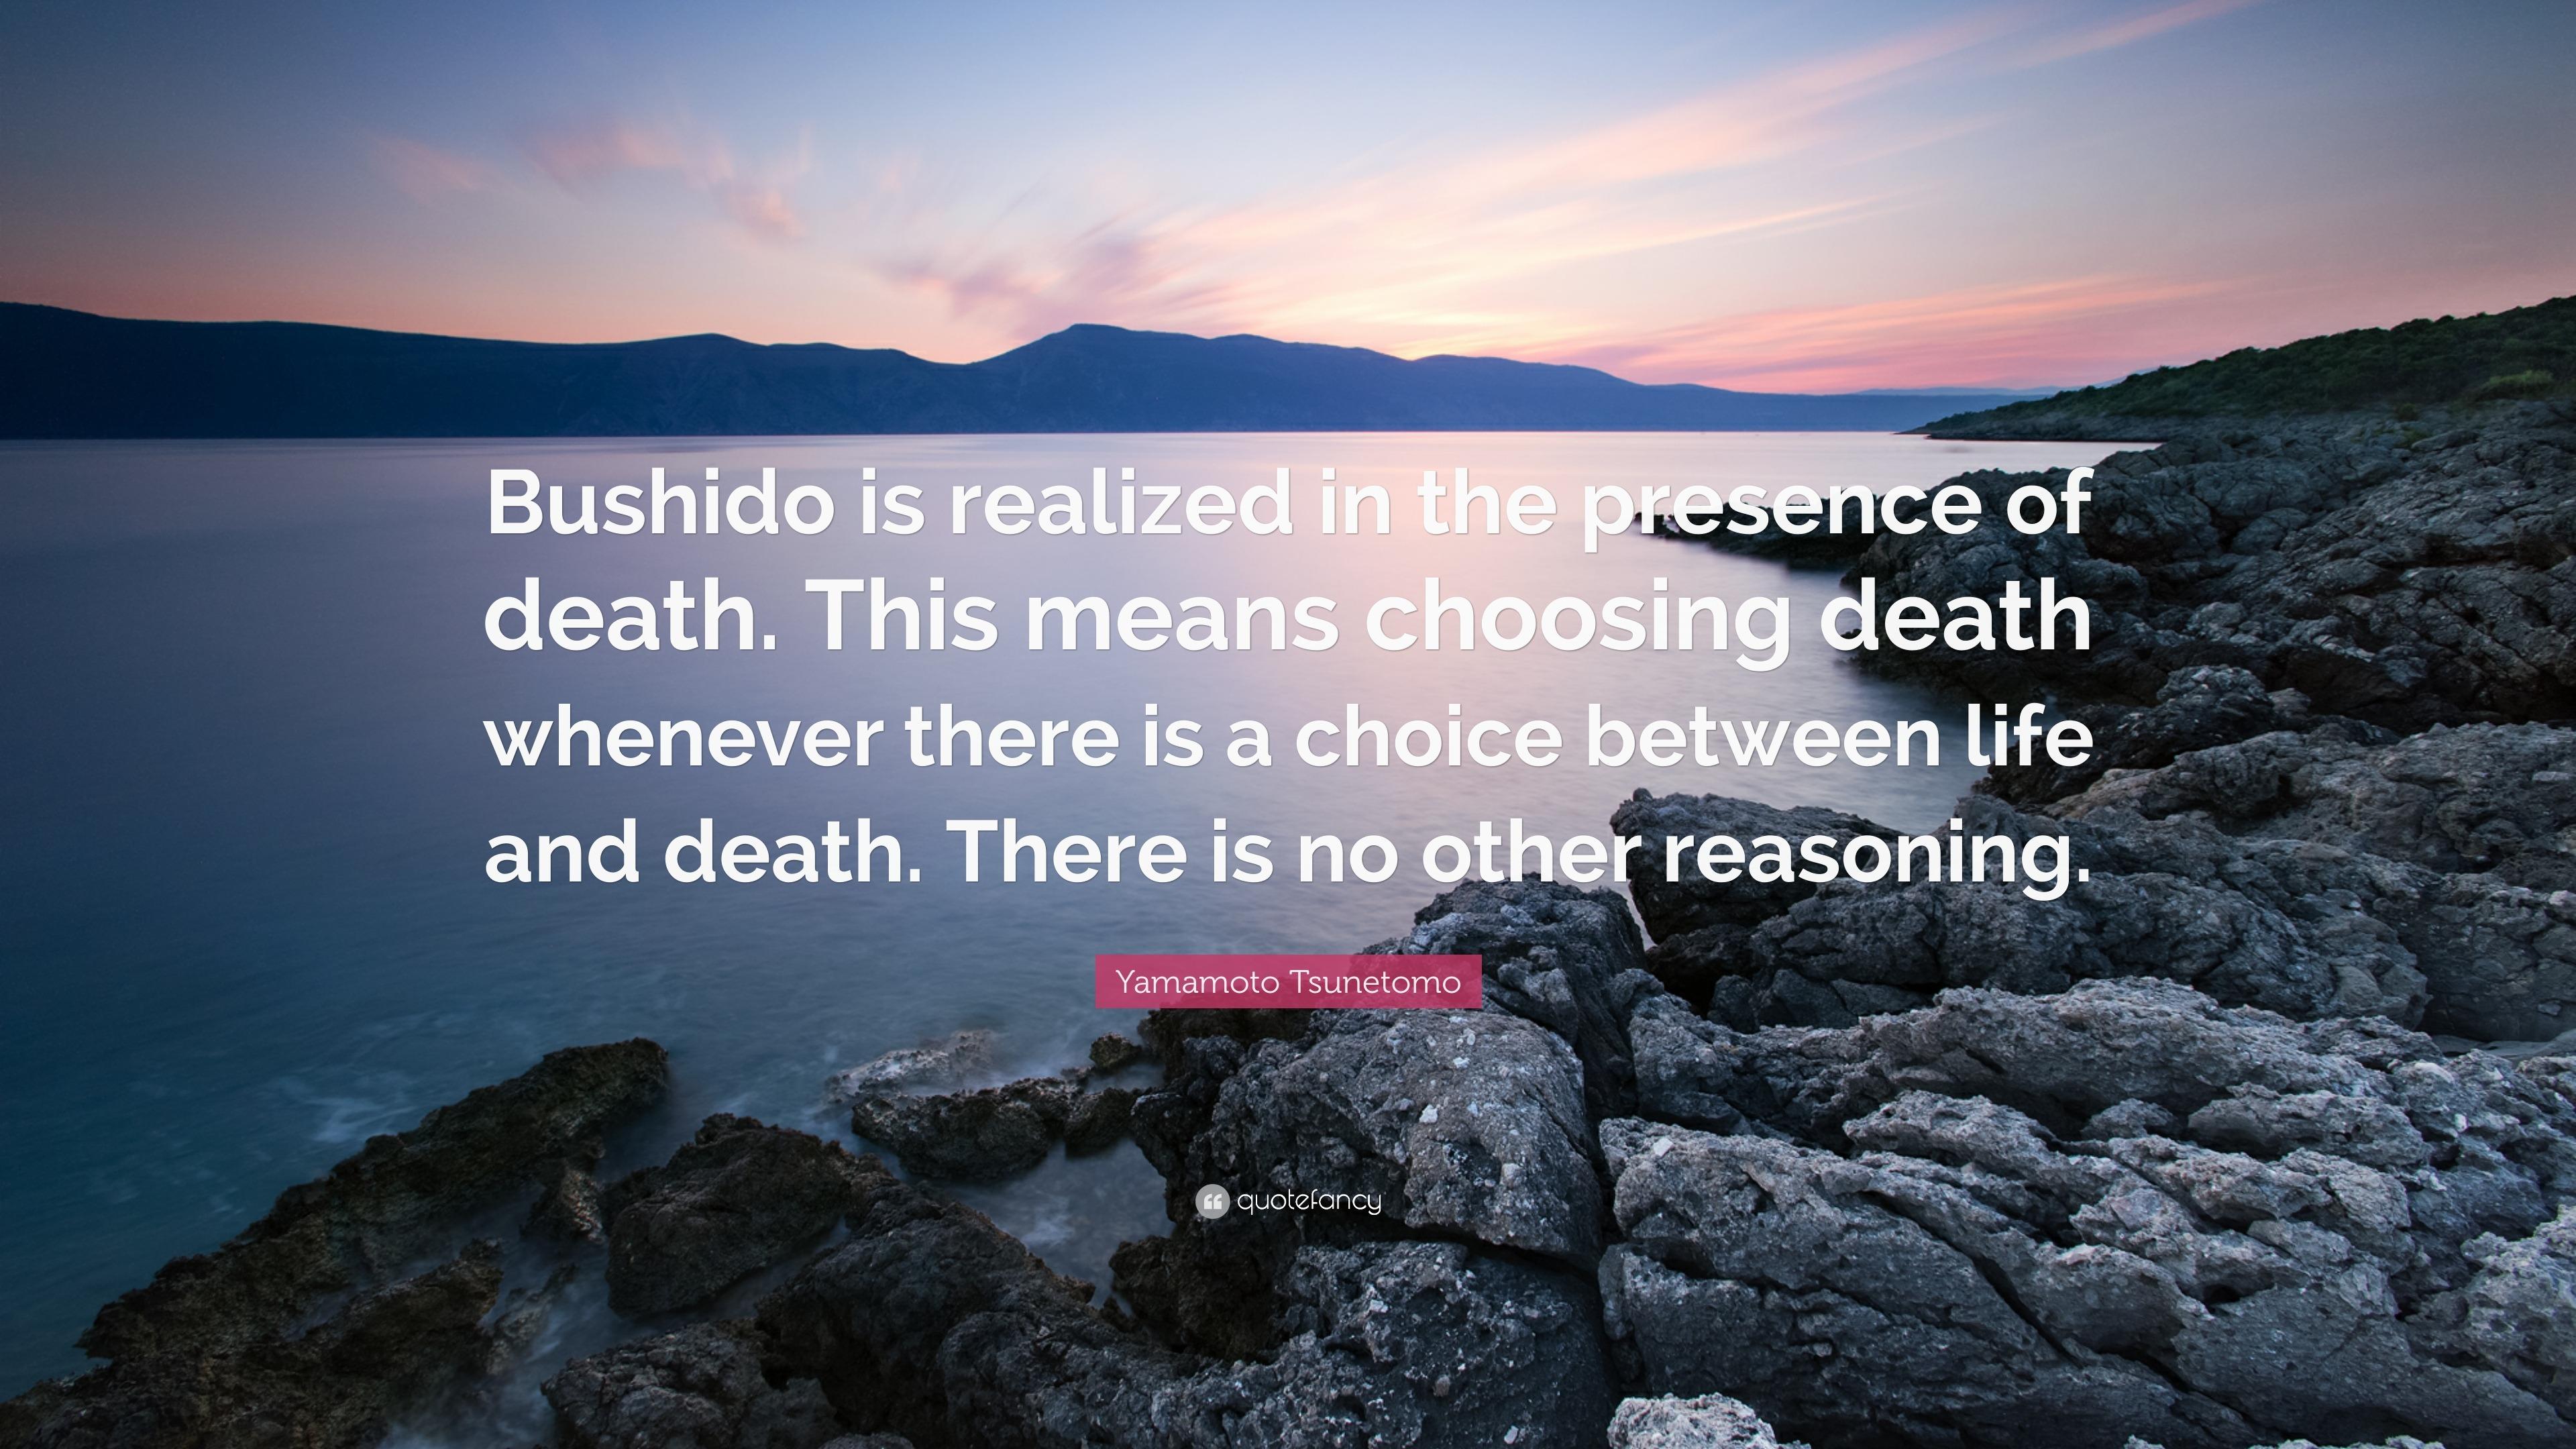 Yamamoto Tsunetomo Quote Bushido Is Realized In The Presence Of